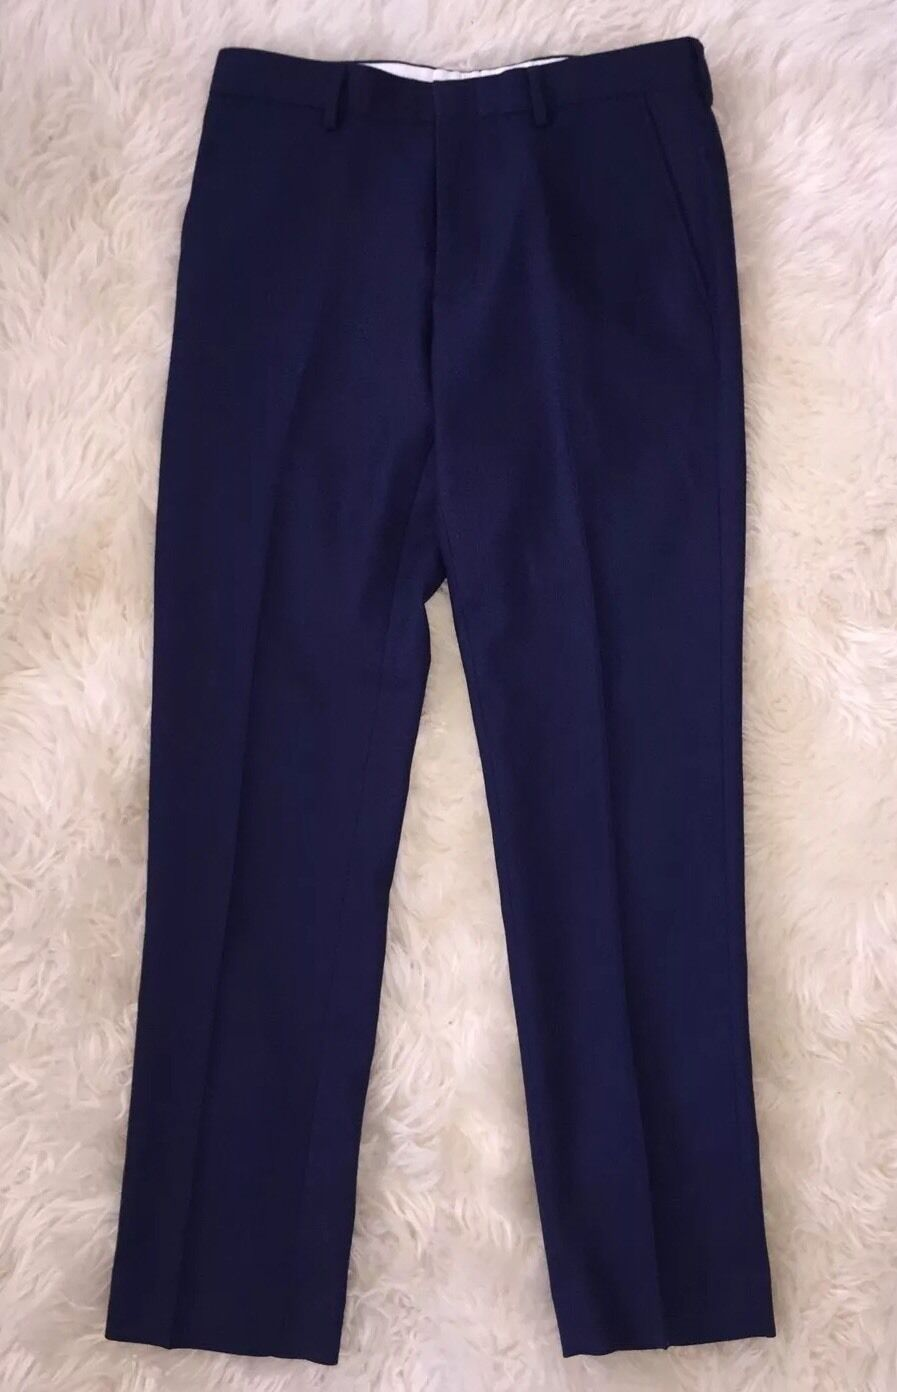 Nwt JCrew  Bowery Slim Pants In Wool W32 L30 Deep Royal bluee 47475 NEW